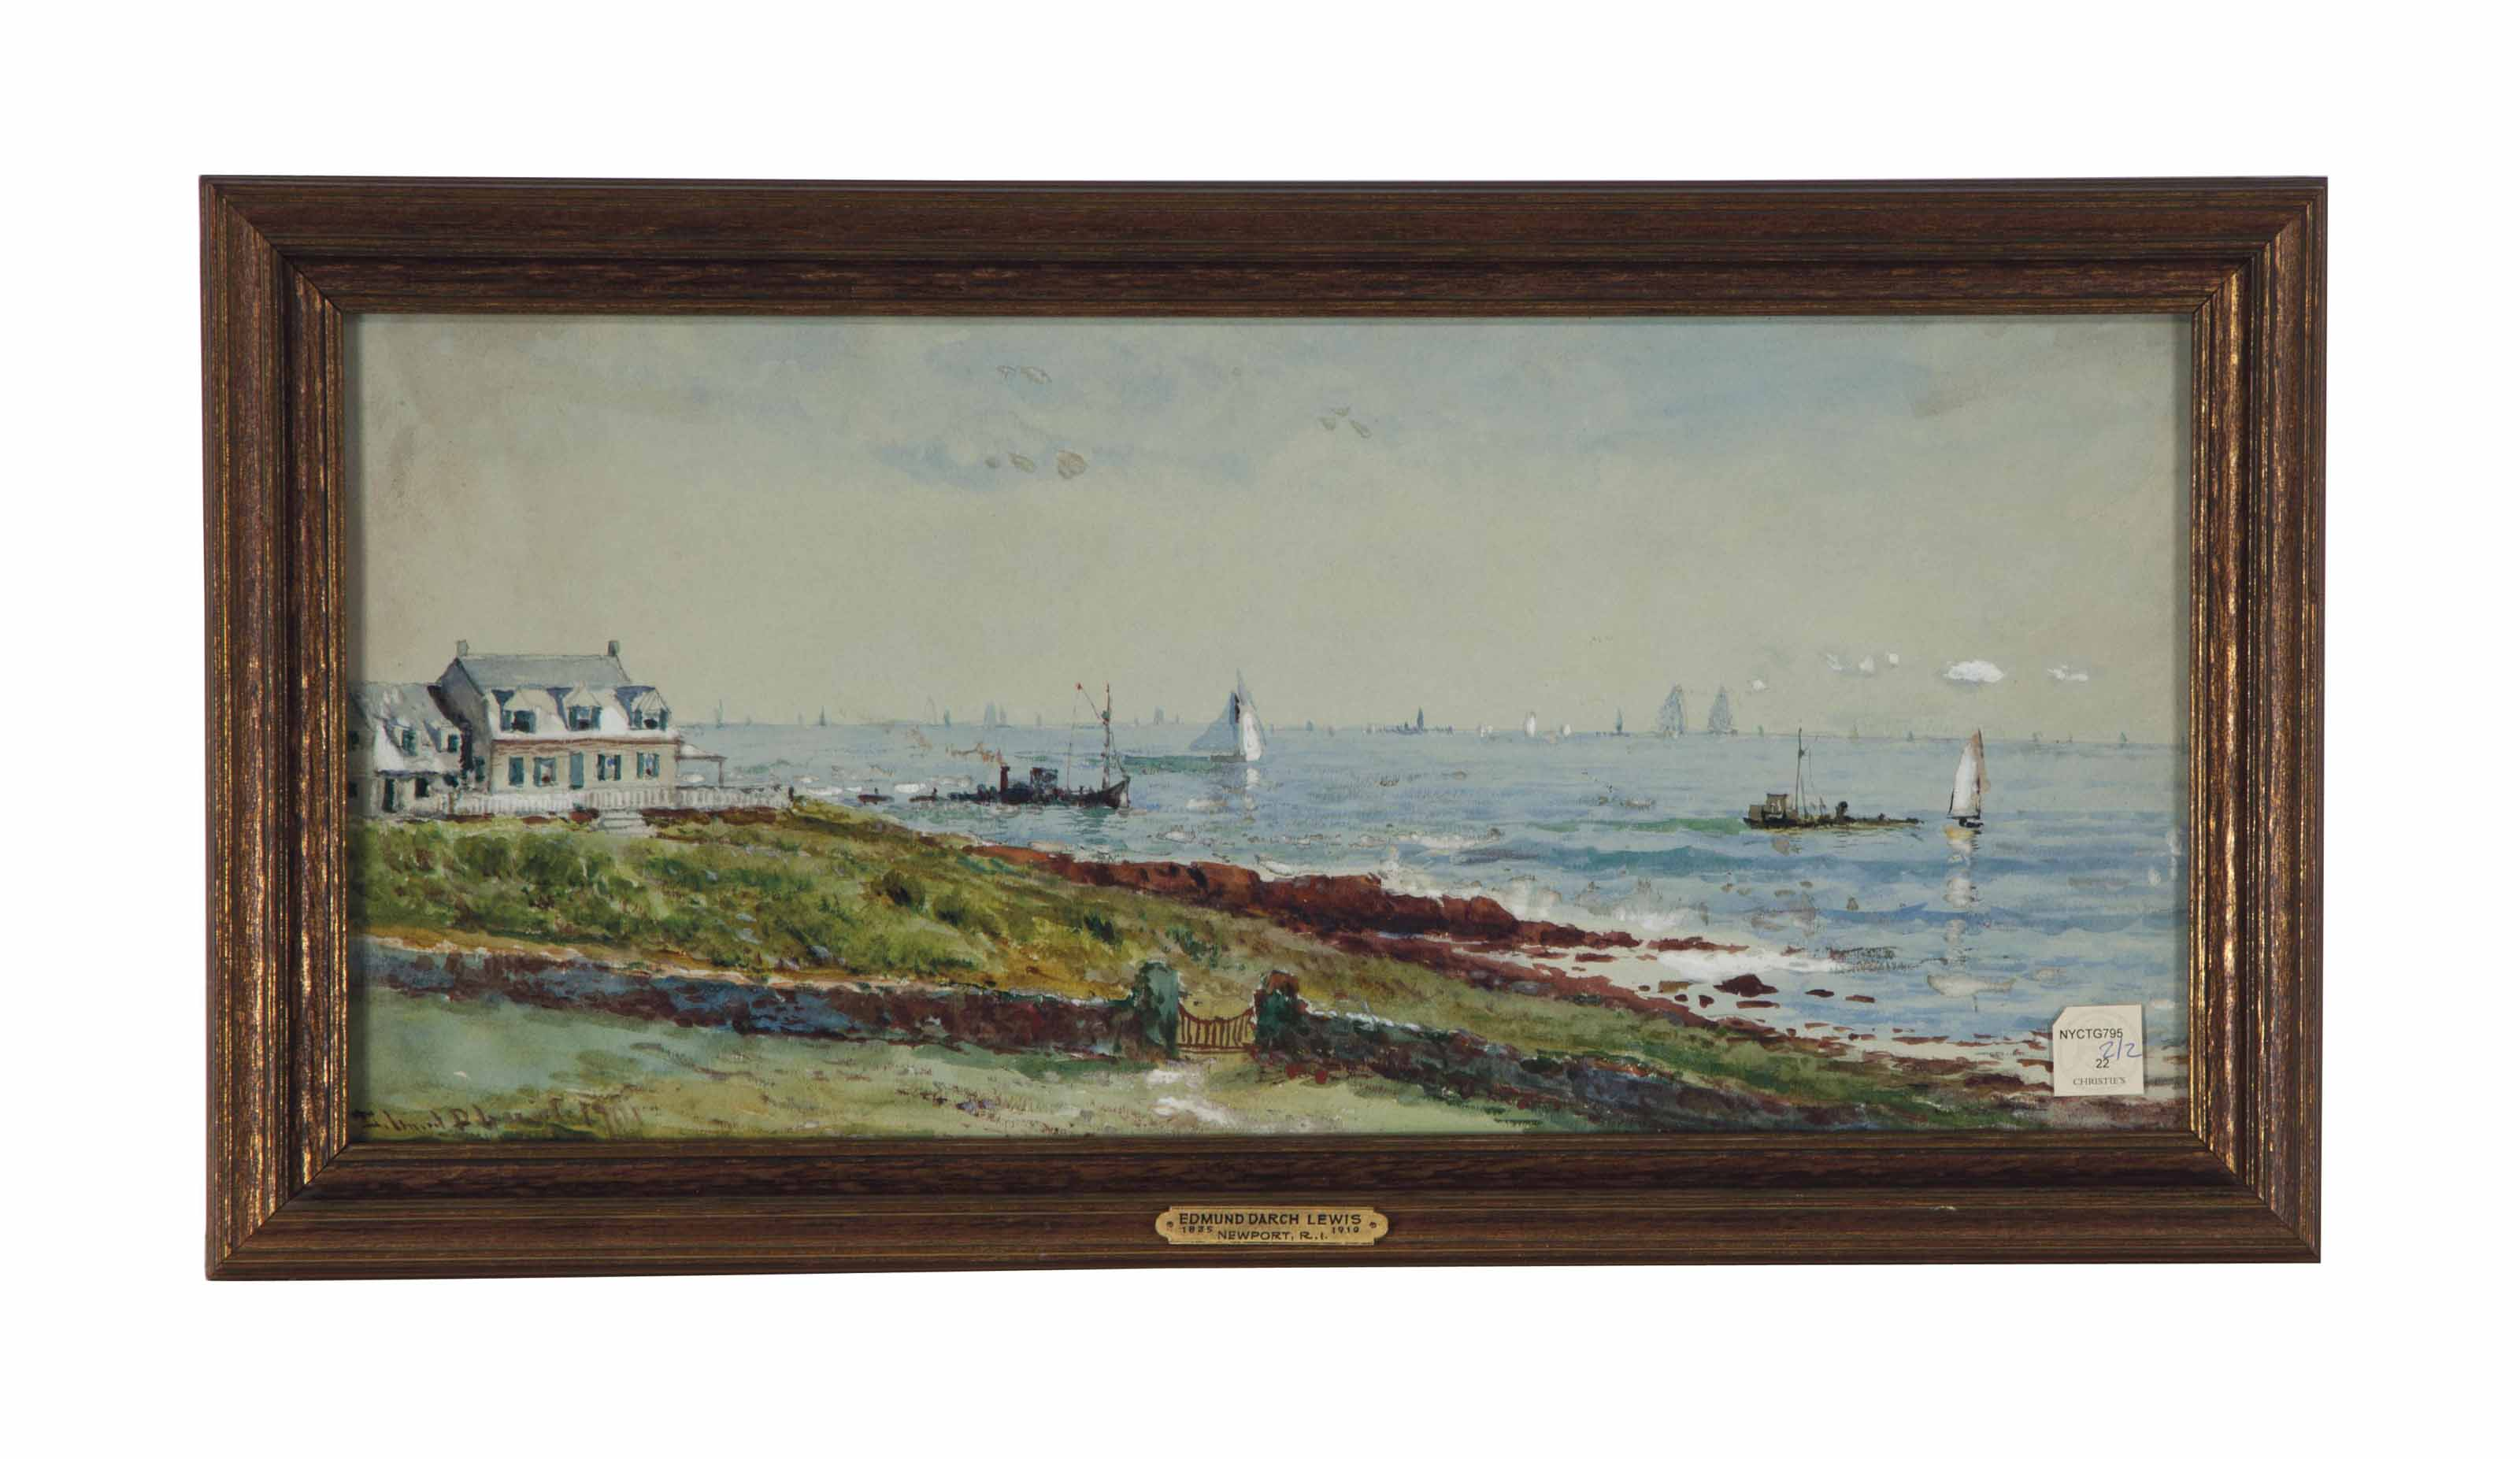 Newport, Rhode Island; and a companion work